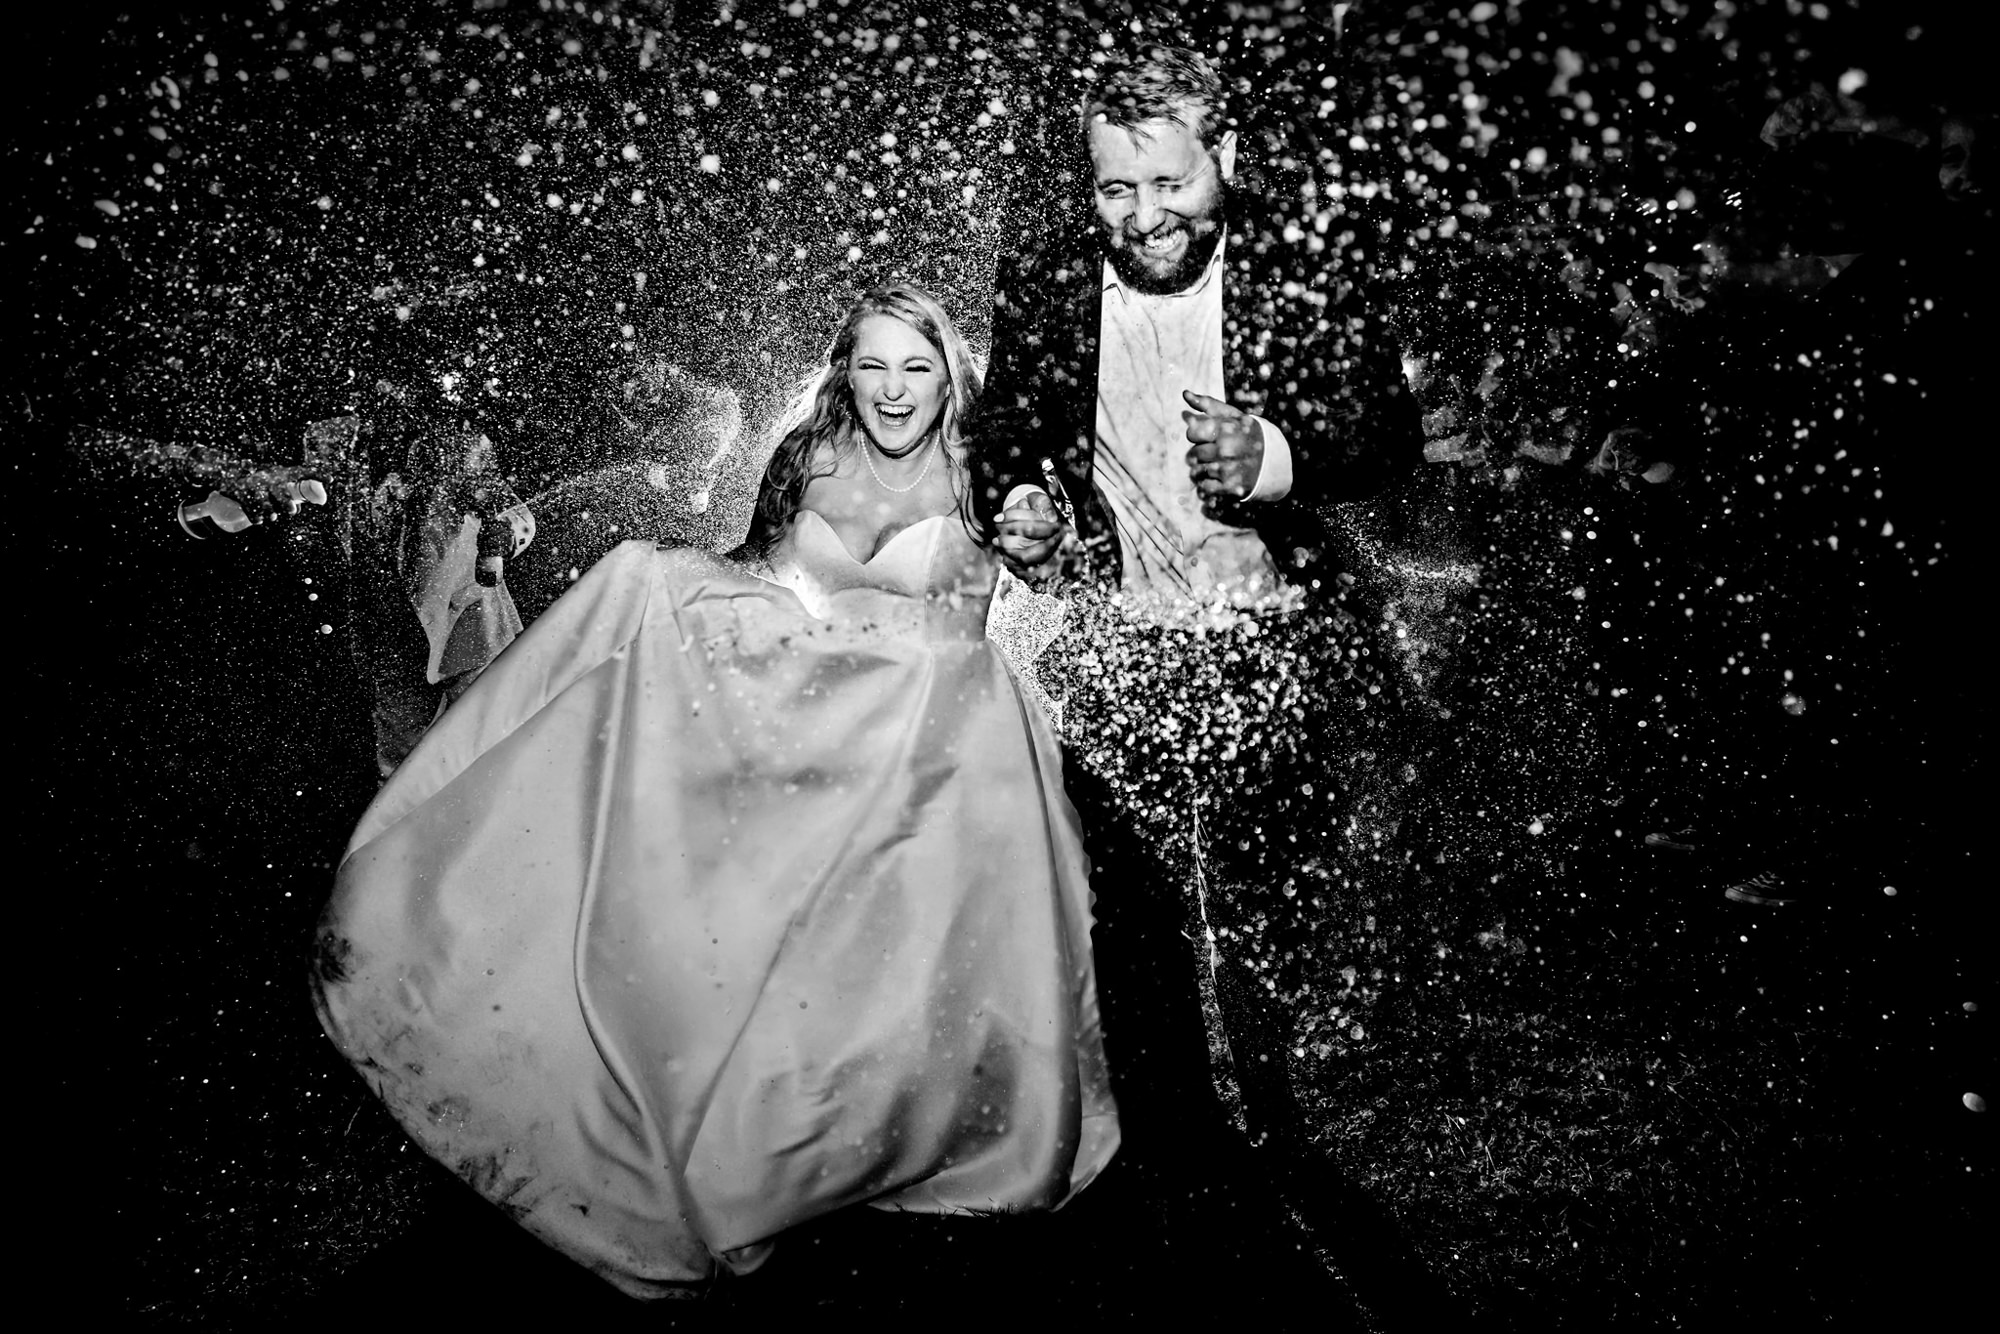 Bride and groom run through snow - photo by Two Mann Studios